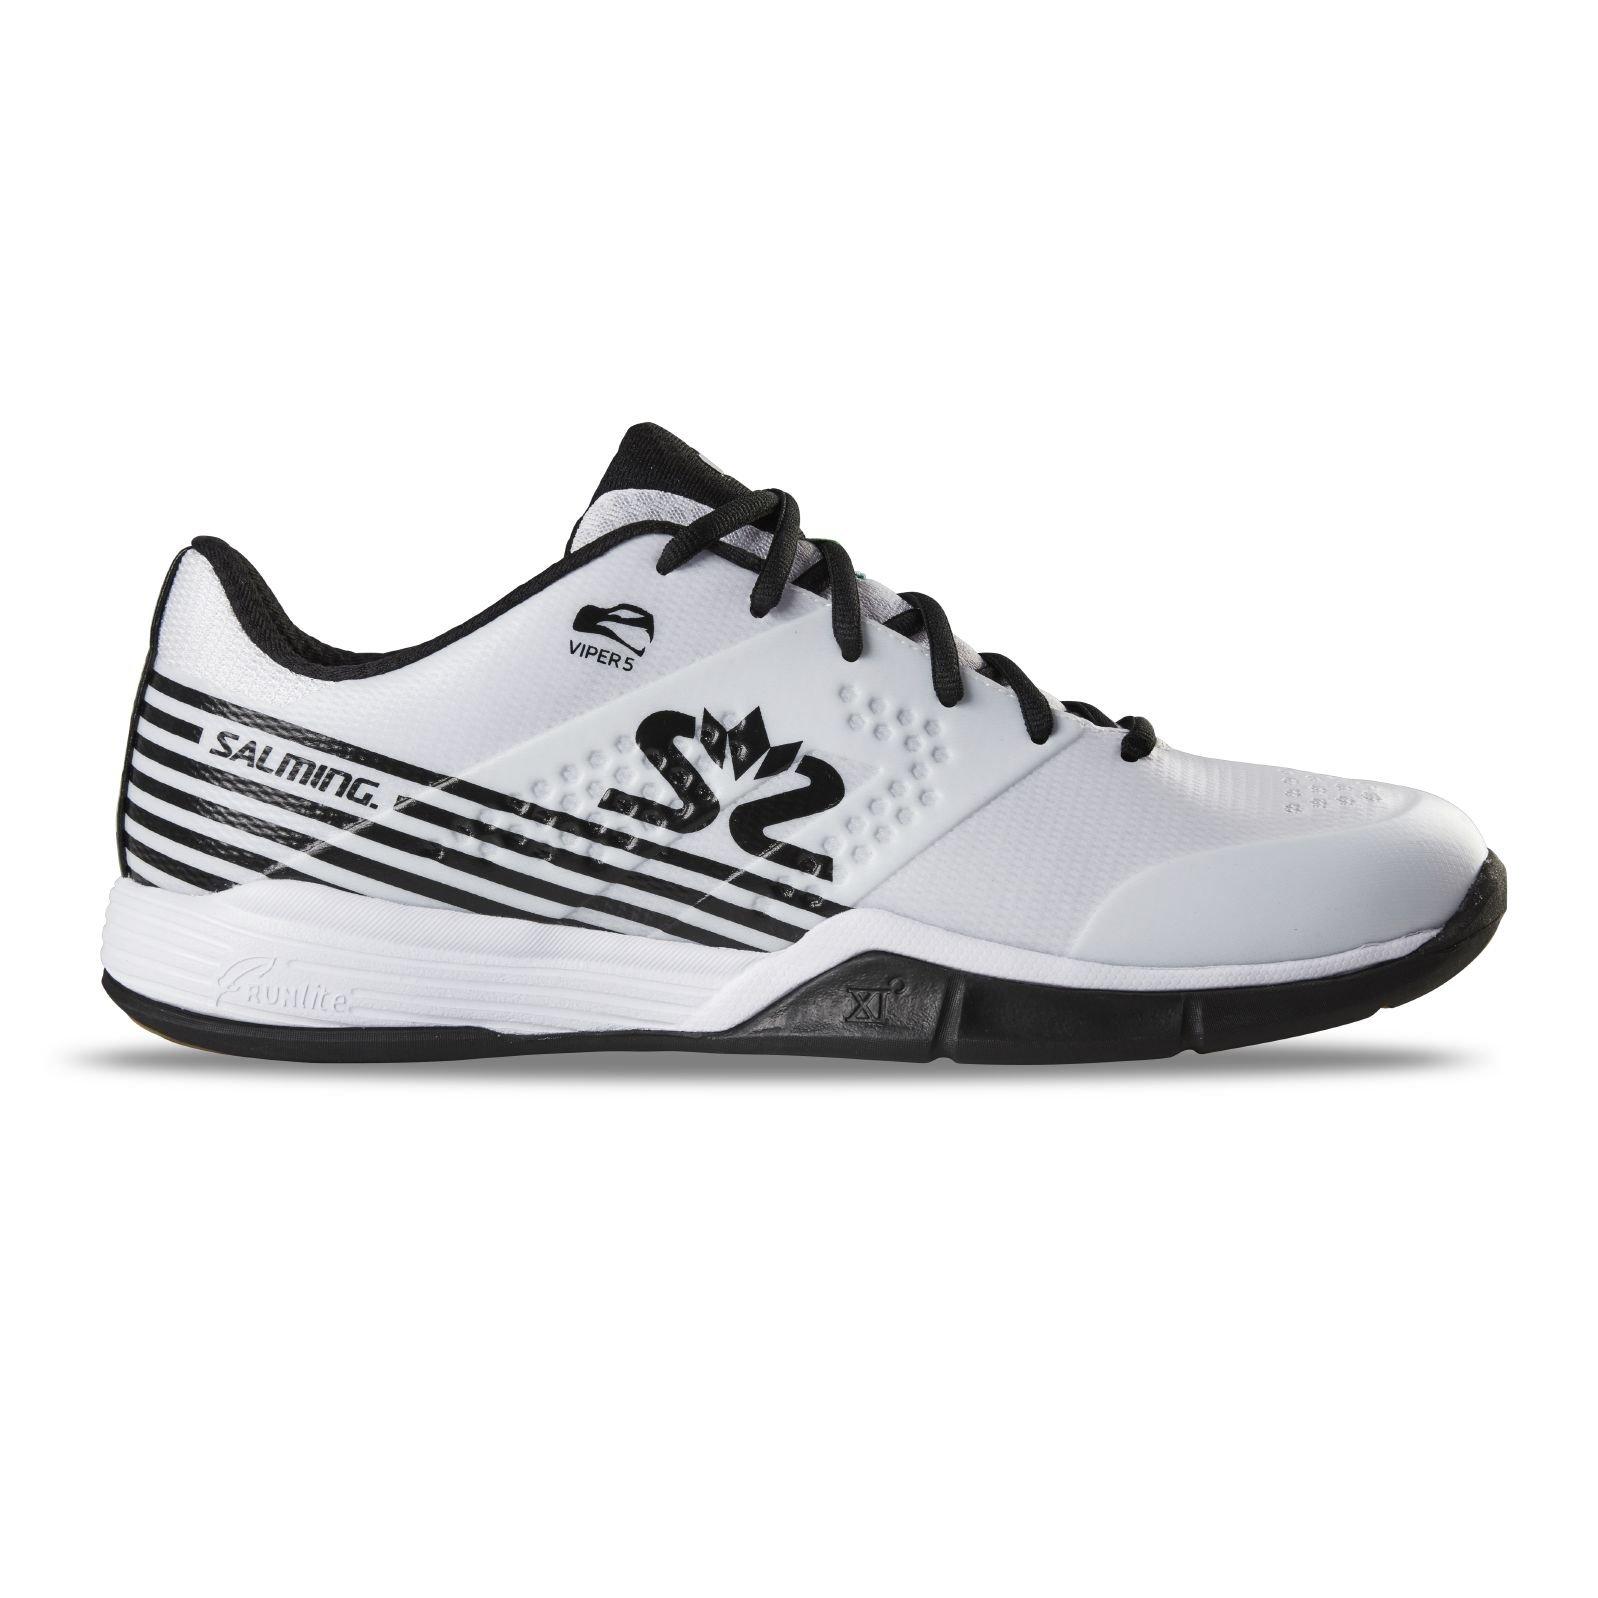 Salming Viper 5 Shoe Men White/Black 49 1/3